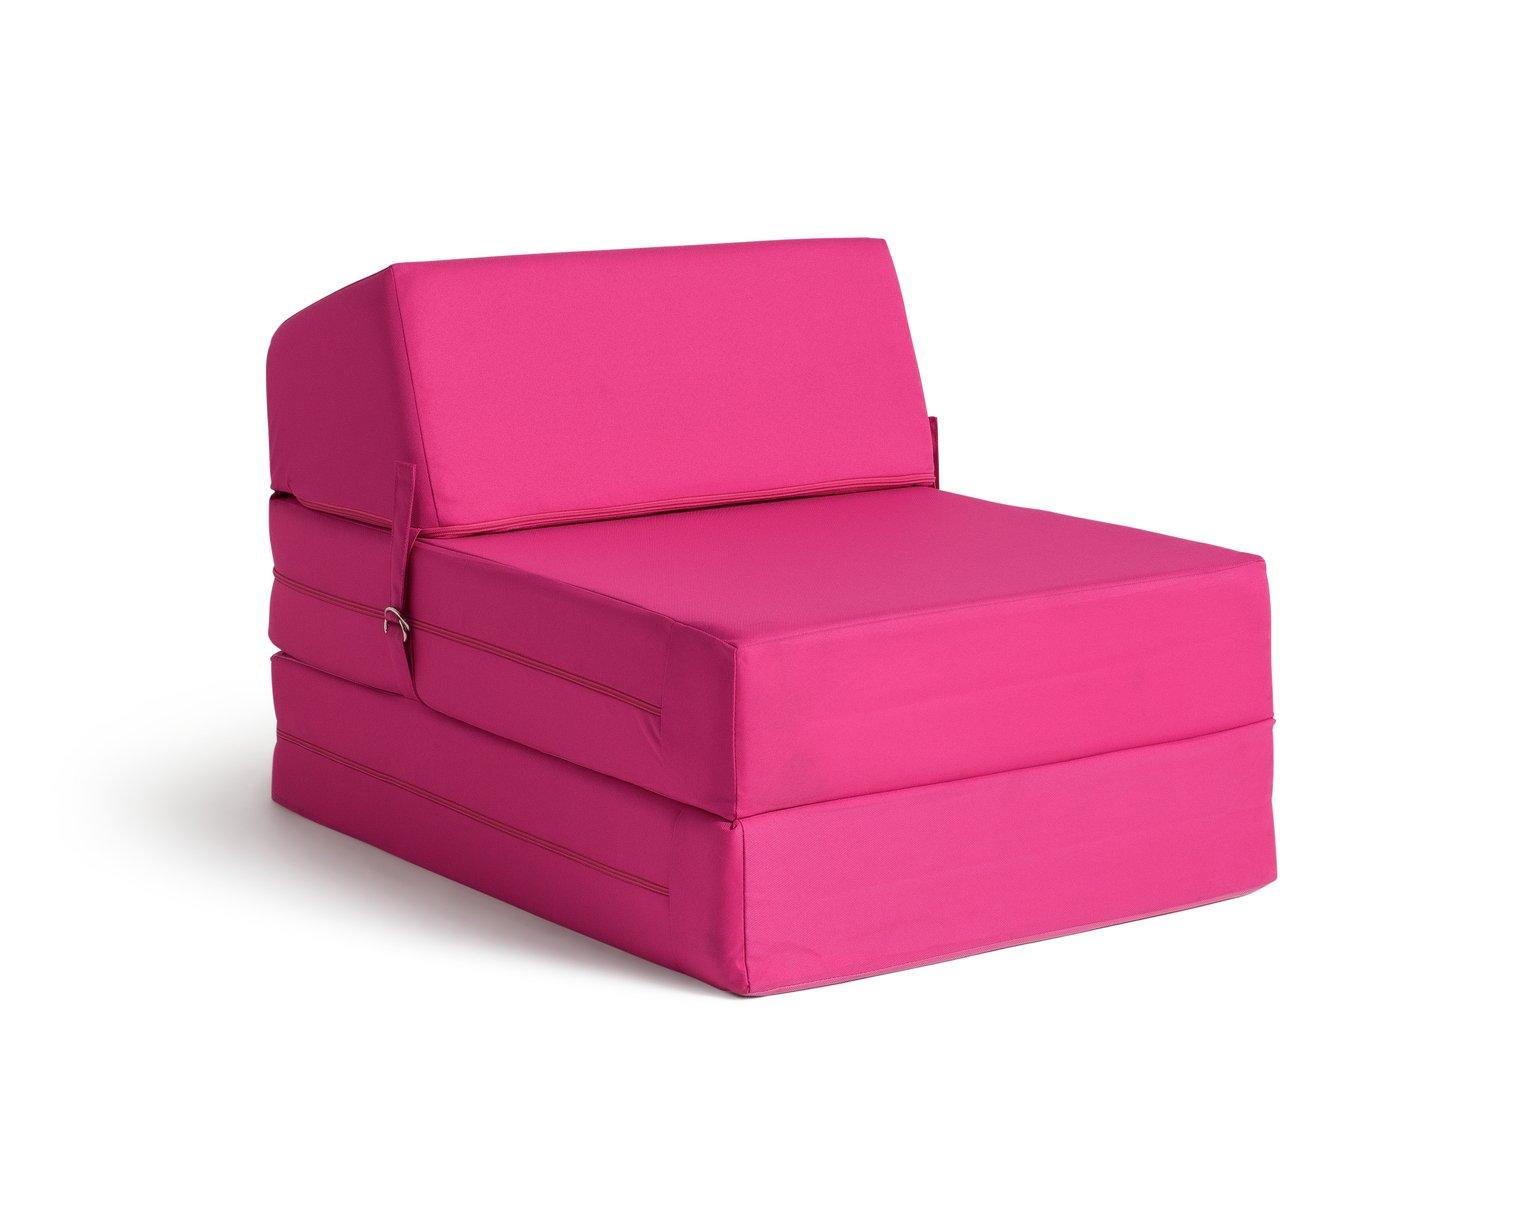 Argos Home Single Cotton Chair Bed - Funky Fuchsia